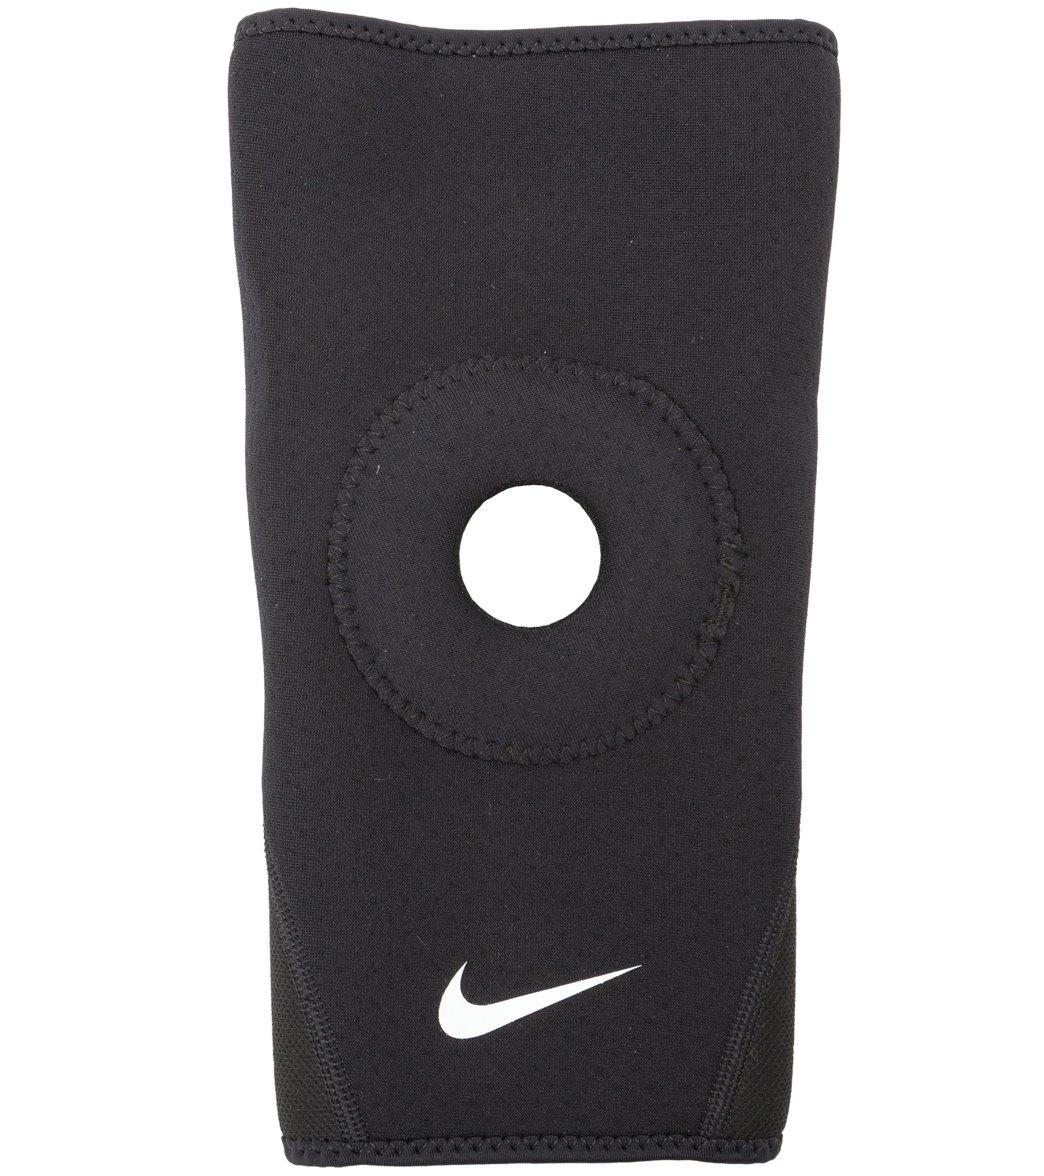 b763263c16 Nike Pro Open-Patella Knee Sleeve 2.0 at SwimOutlet.com